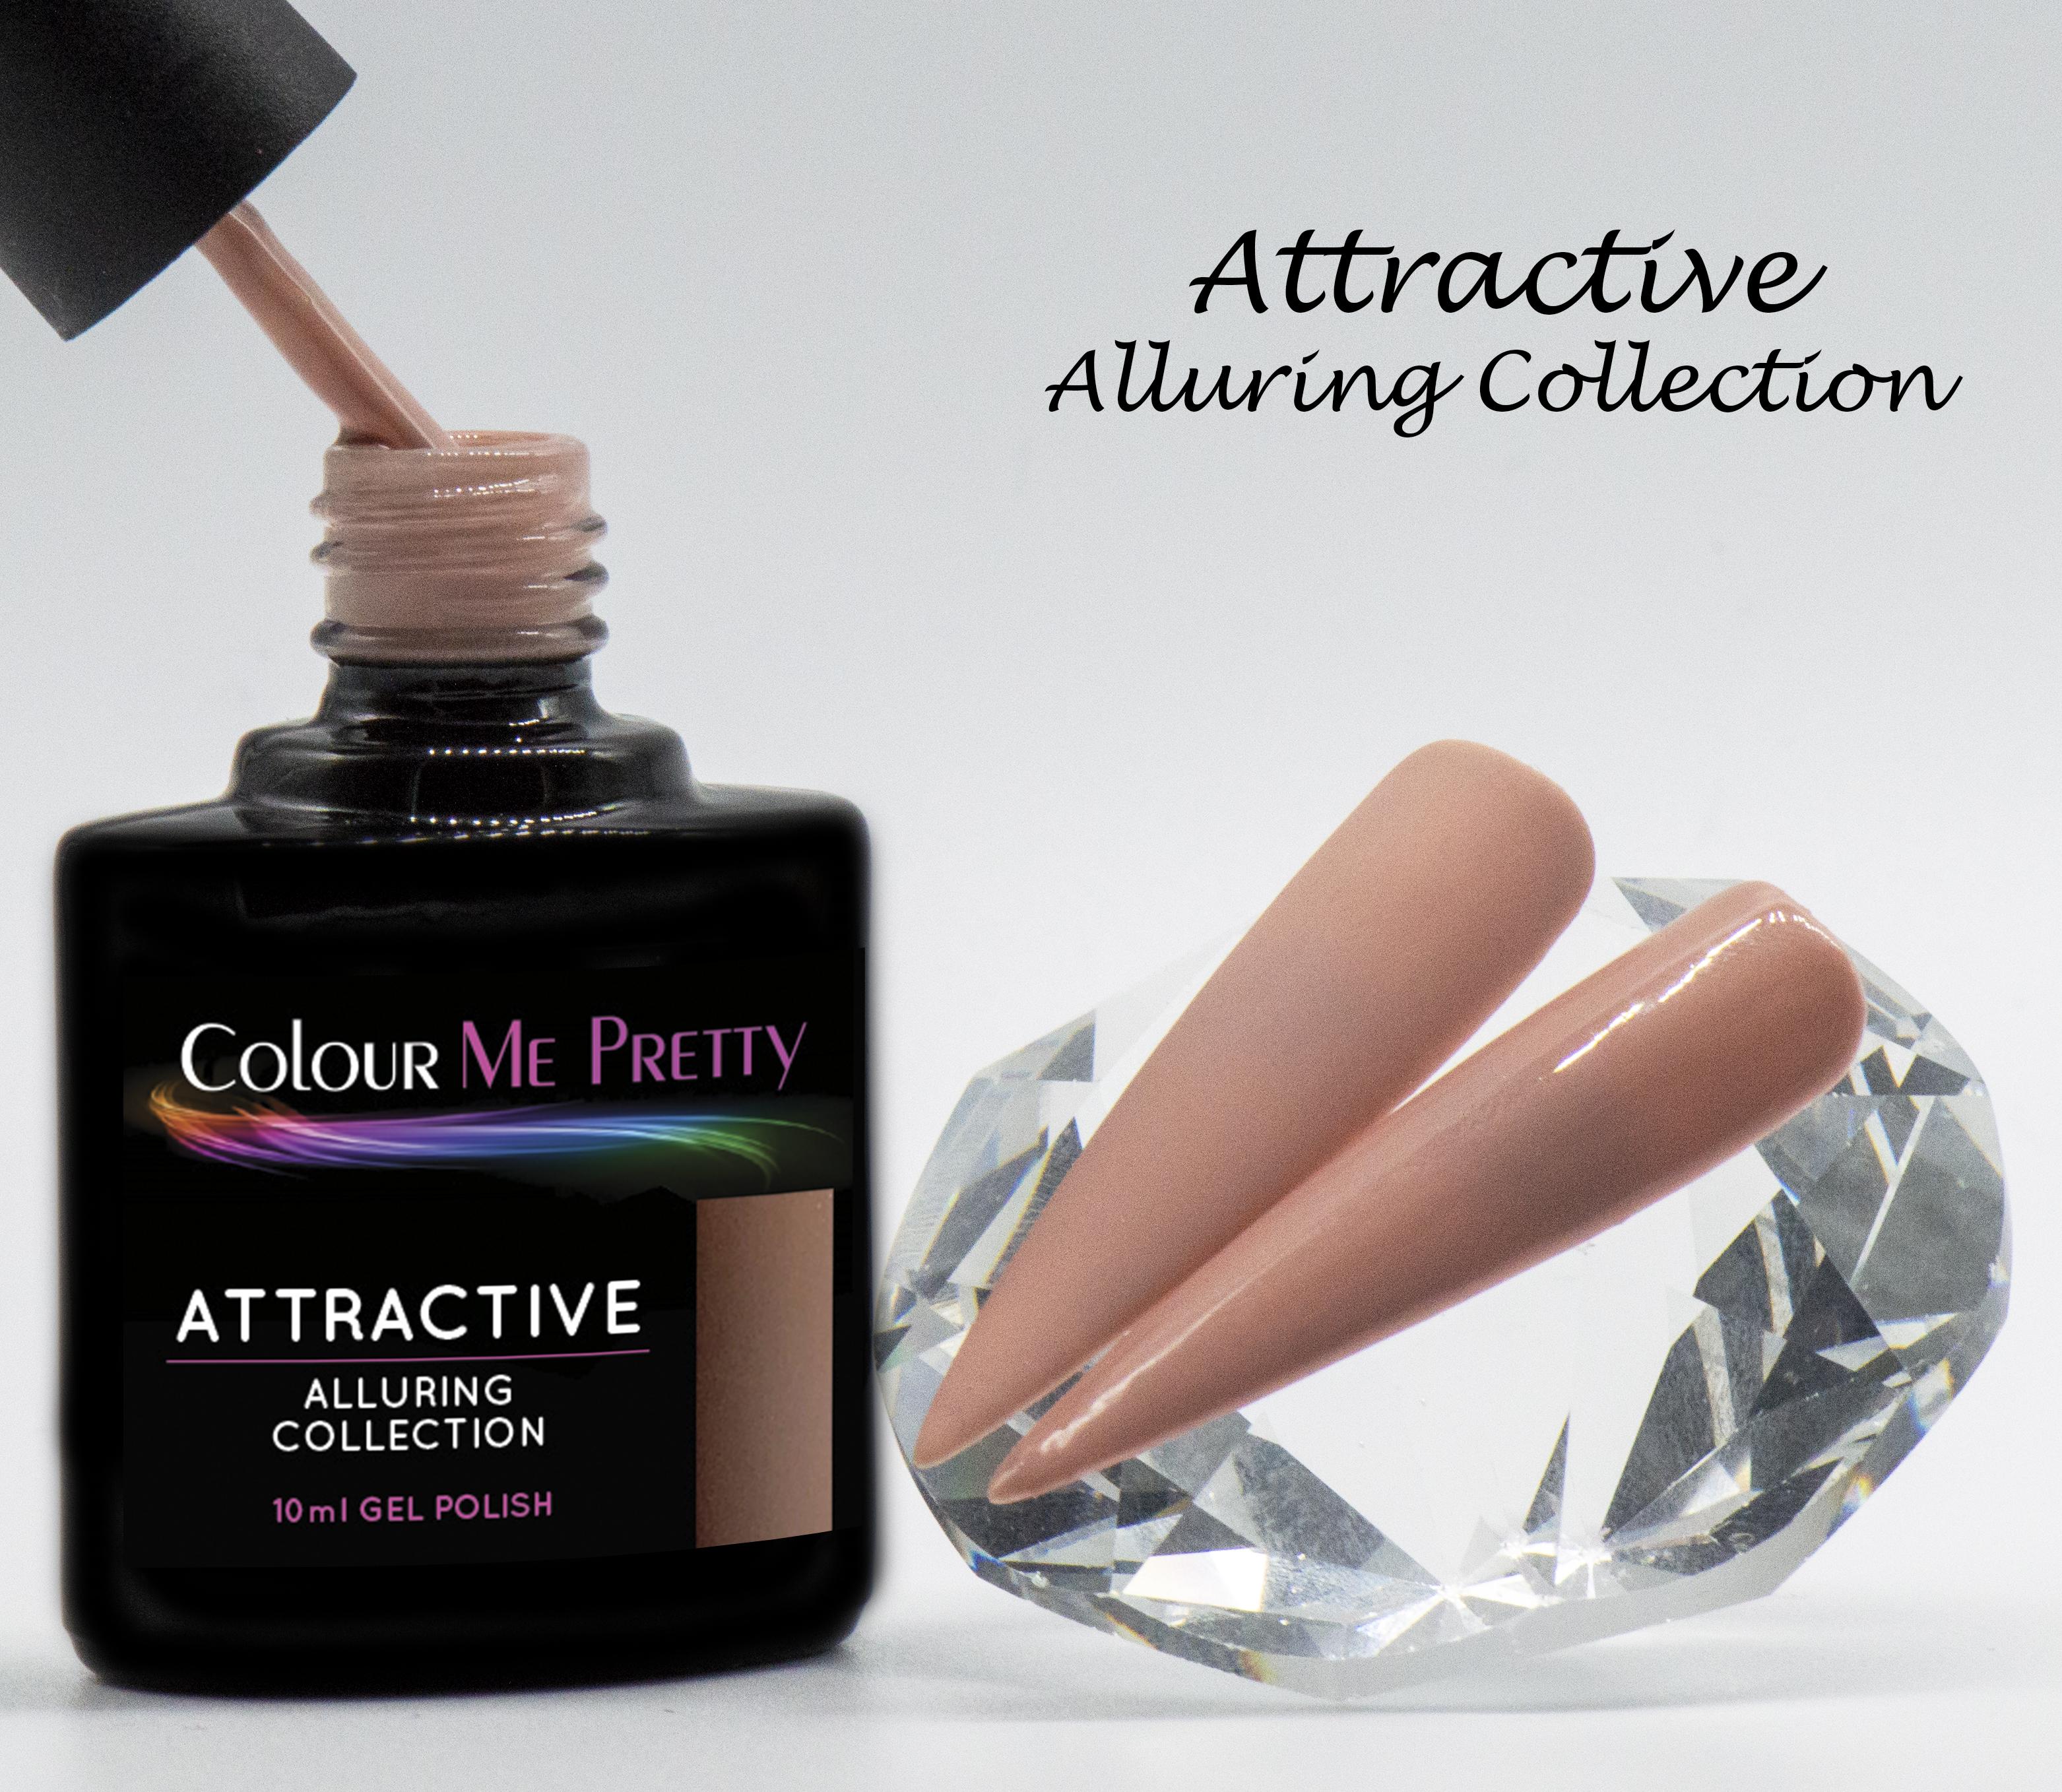 Alluring Attractive